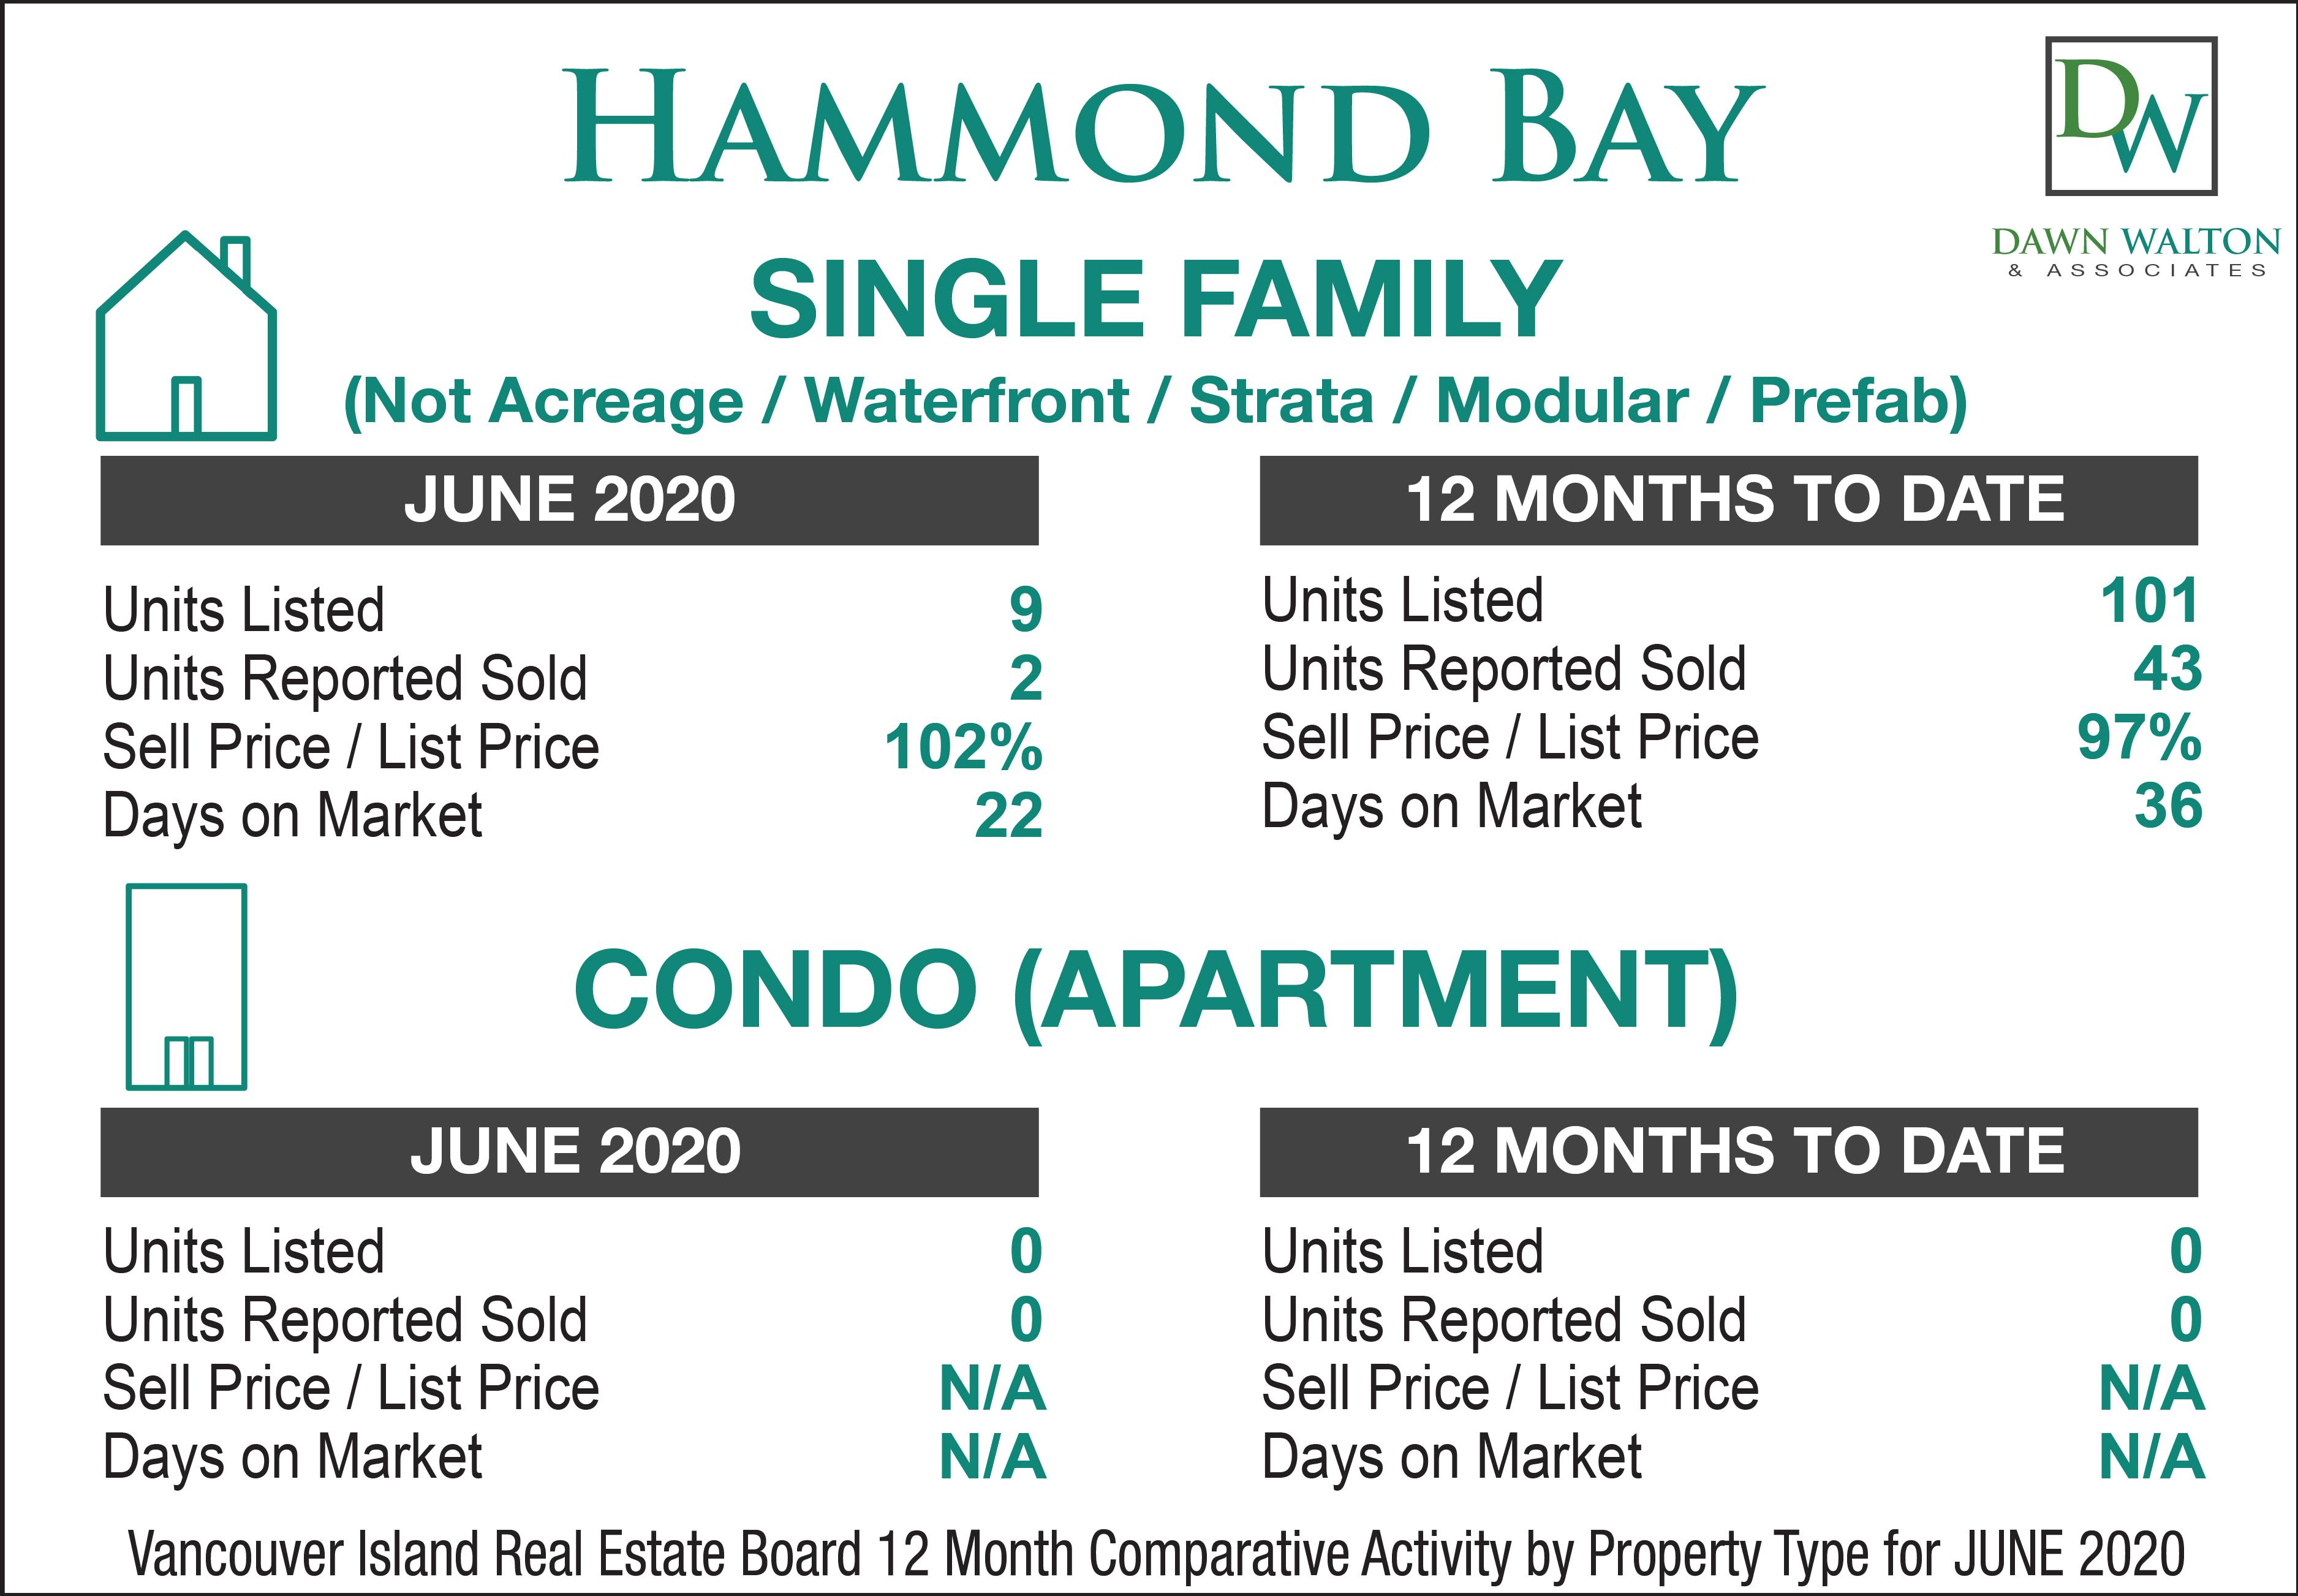 Hammond Bay Real Estate Market Stats June 2020 - Nanaimo Realtor Dawn Walton